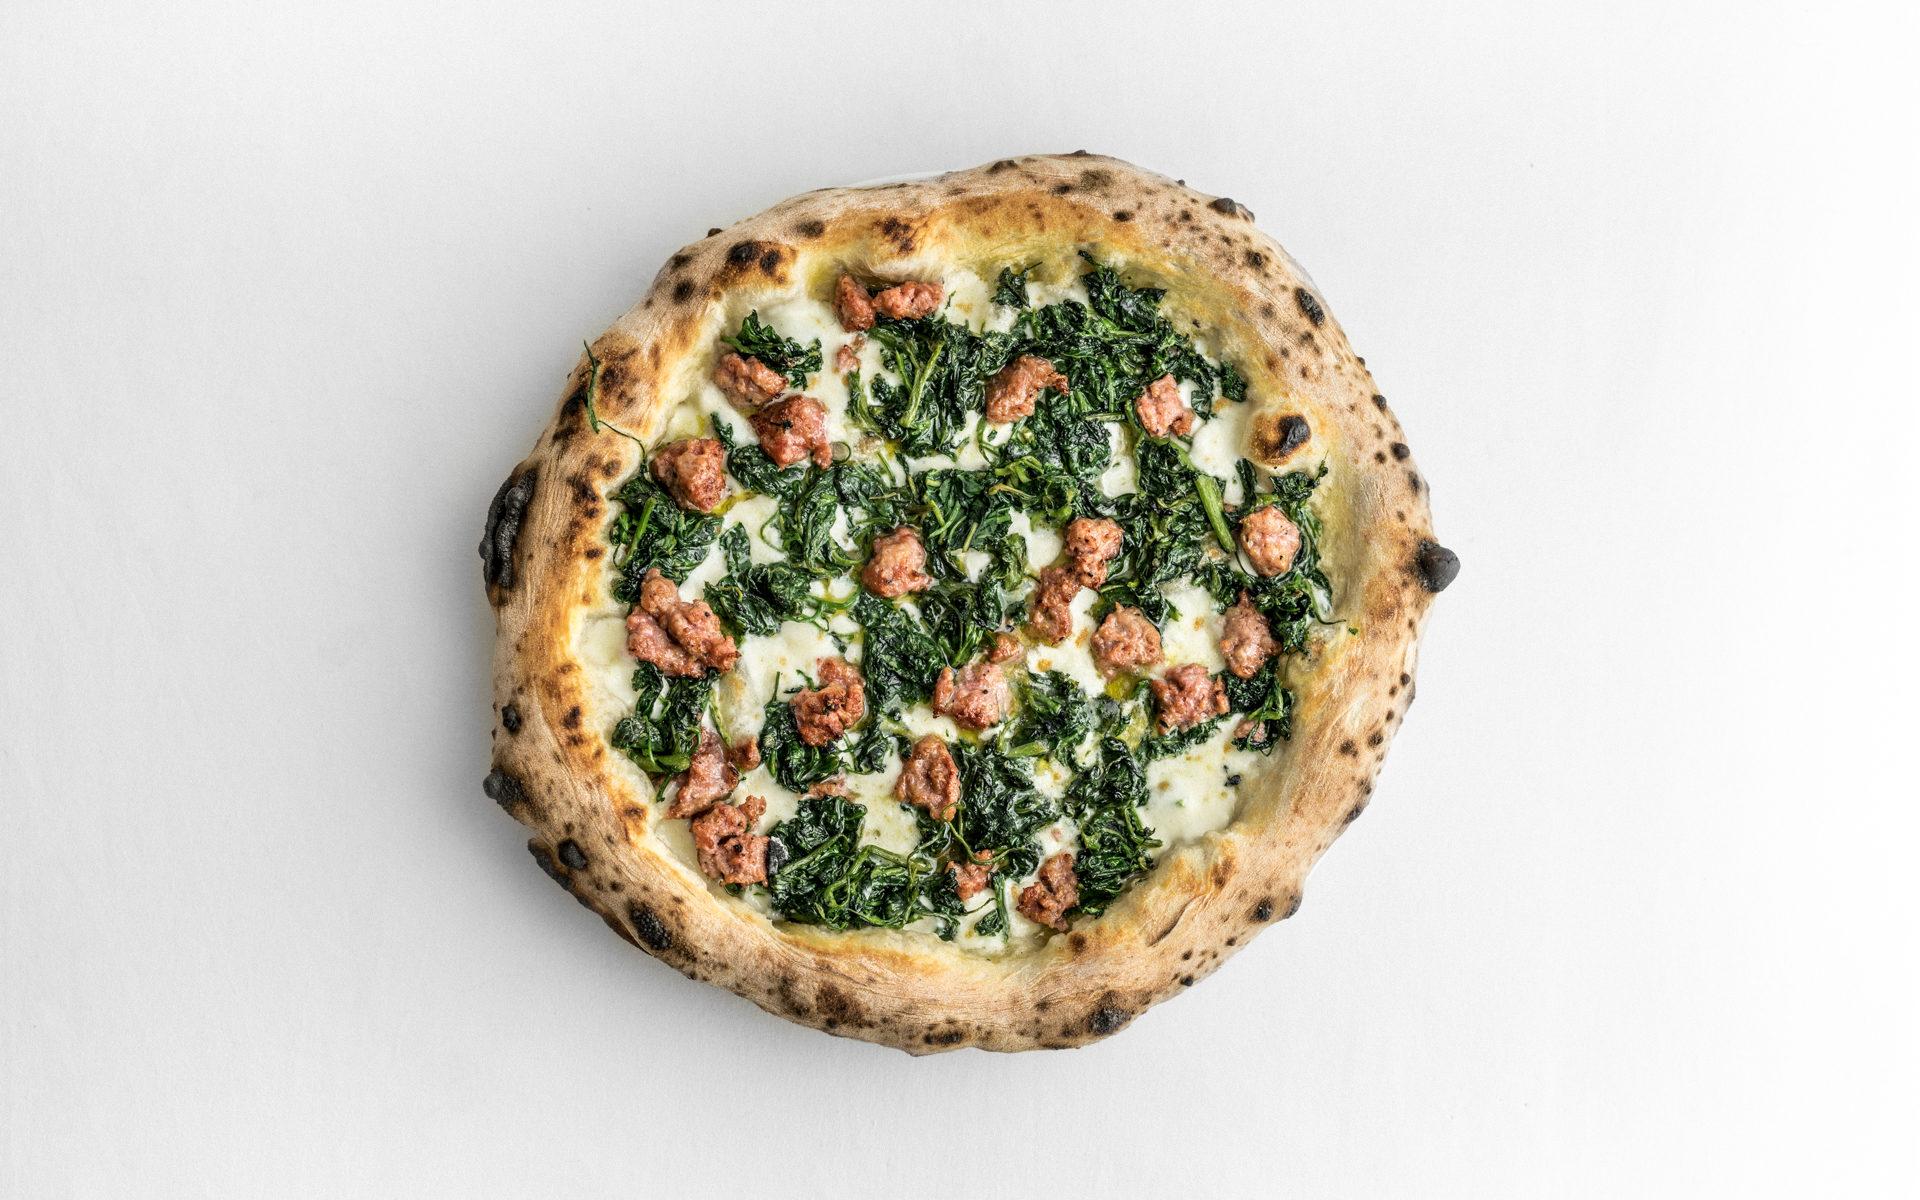 Pizza orapi, amaranto e salsiccia, infoodfamily